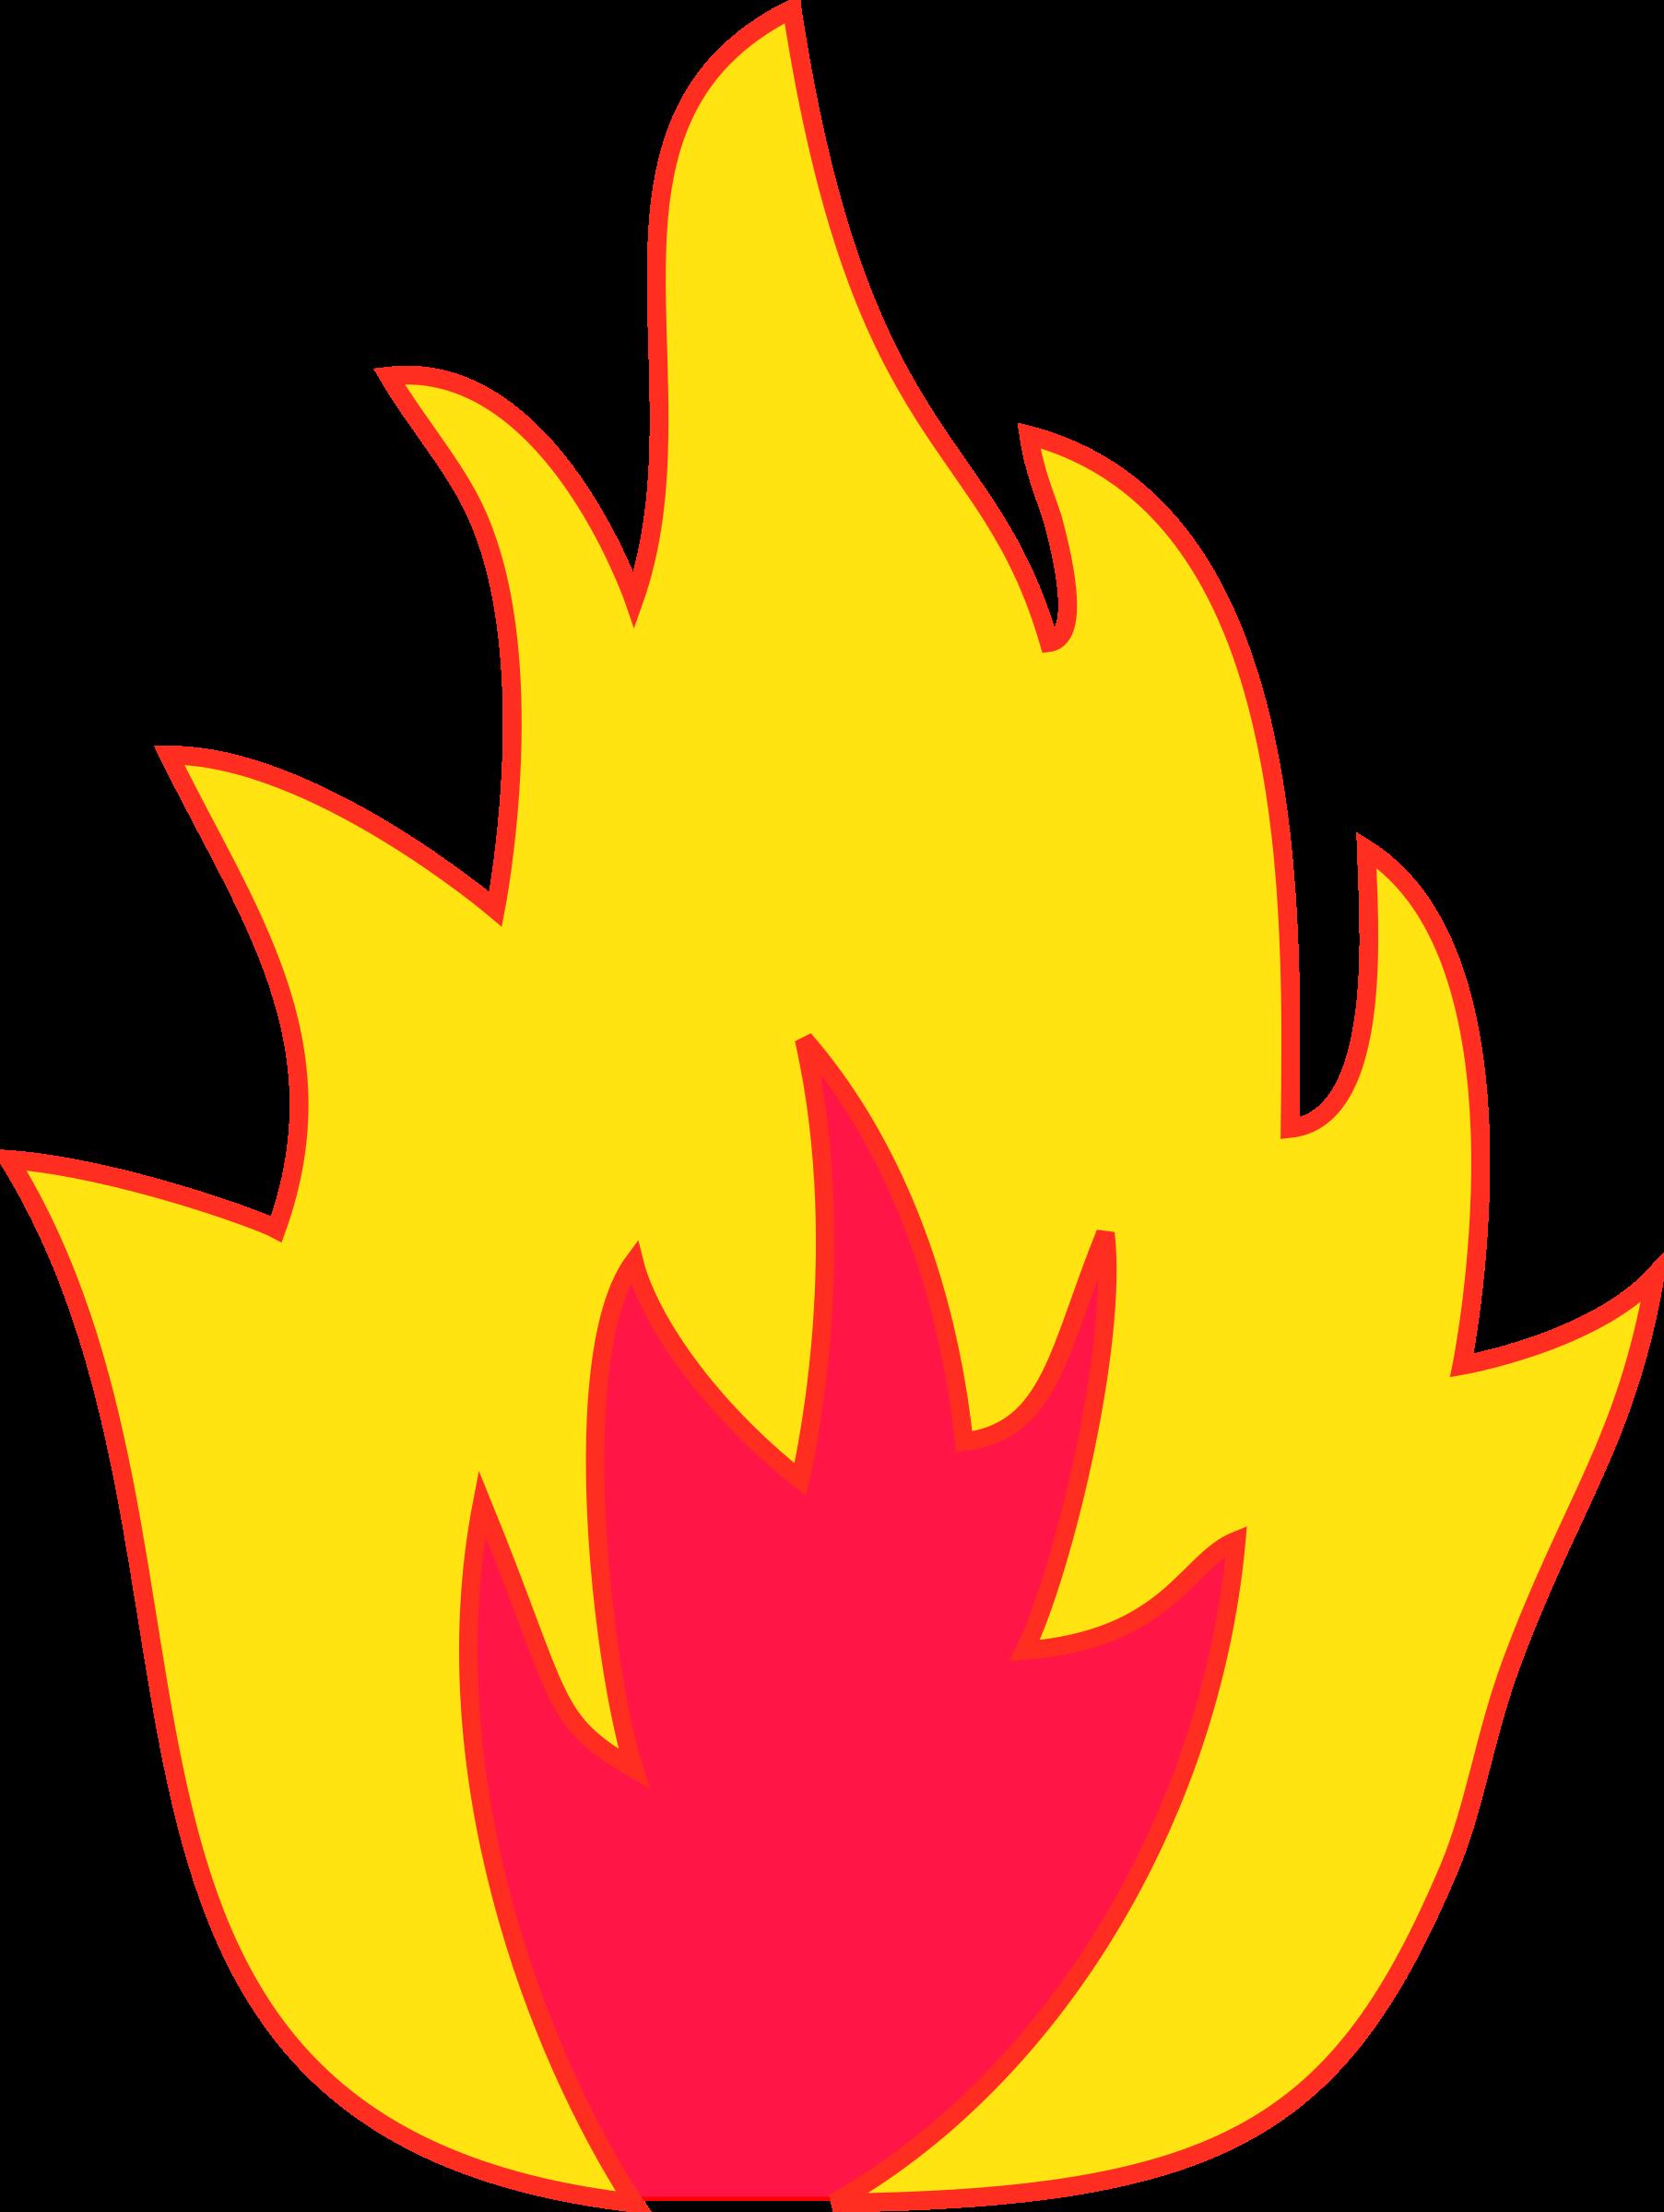 Big image png. Clipart fire conflagration